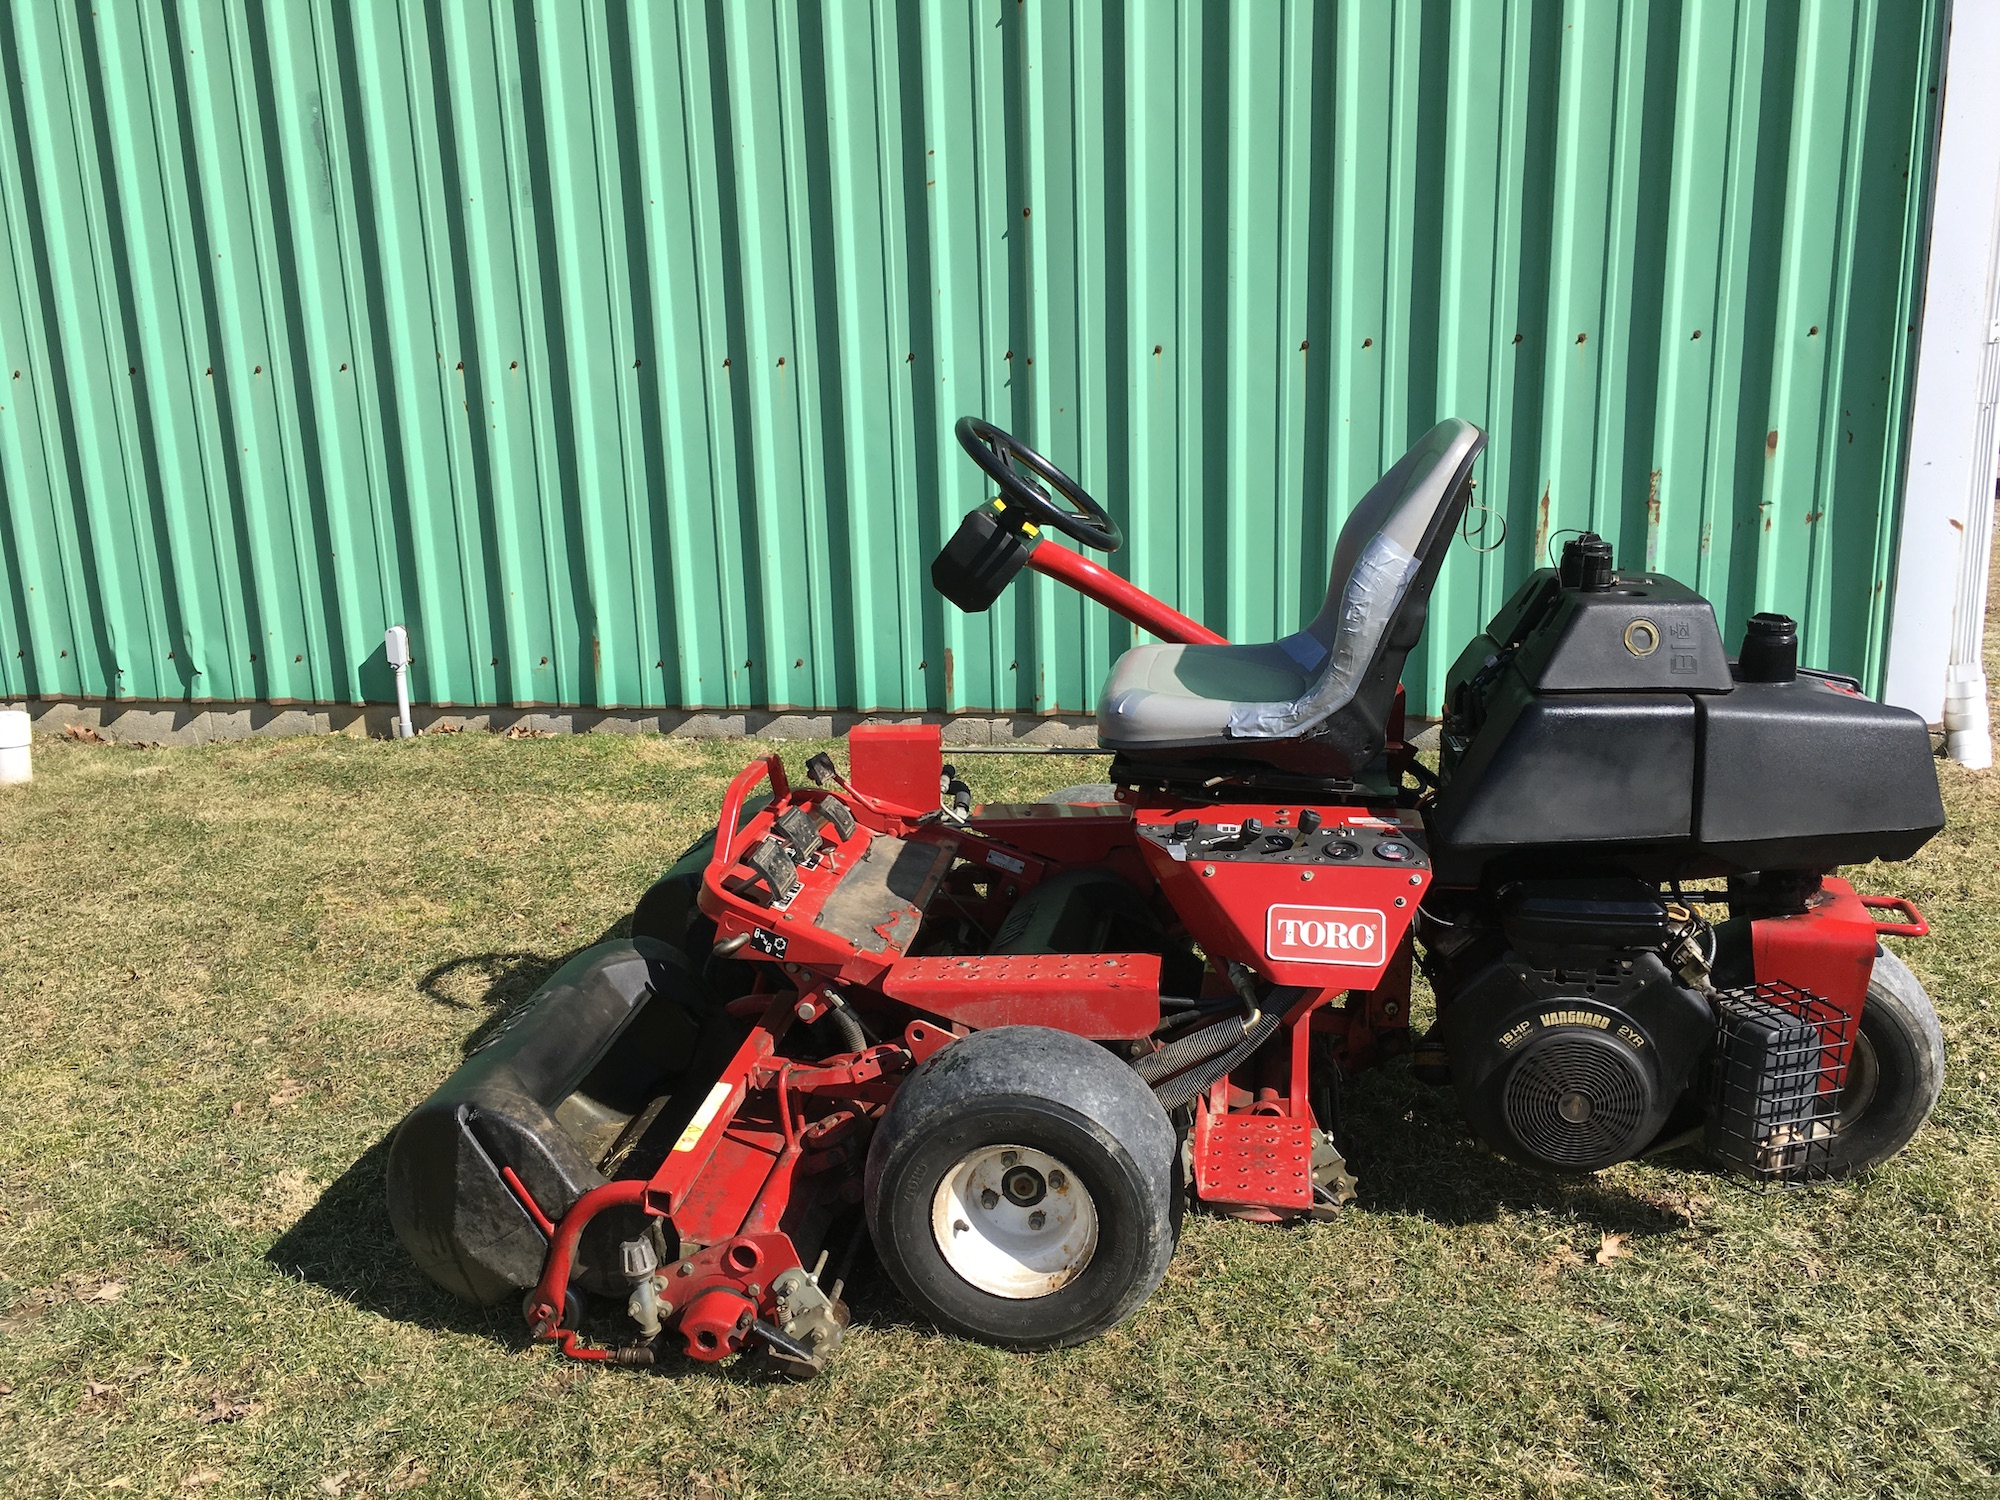 Toro-3100-Triplex-Greensmaster-Mower-02